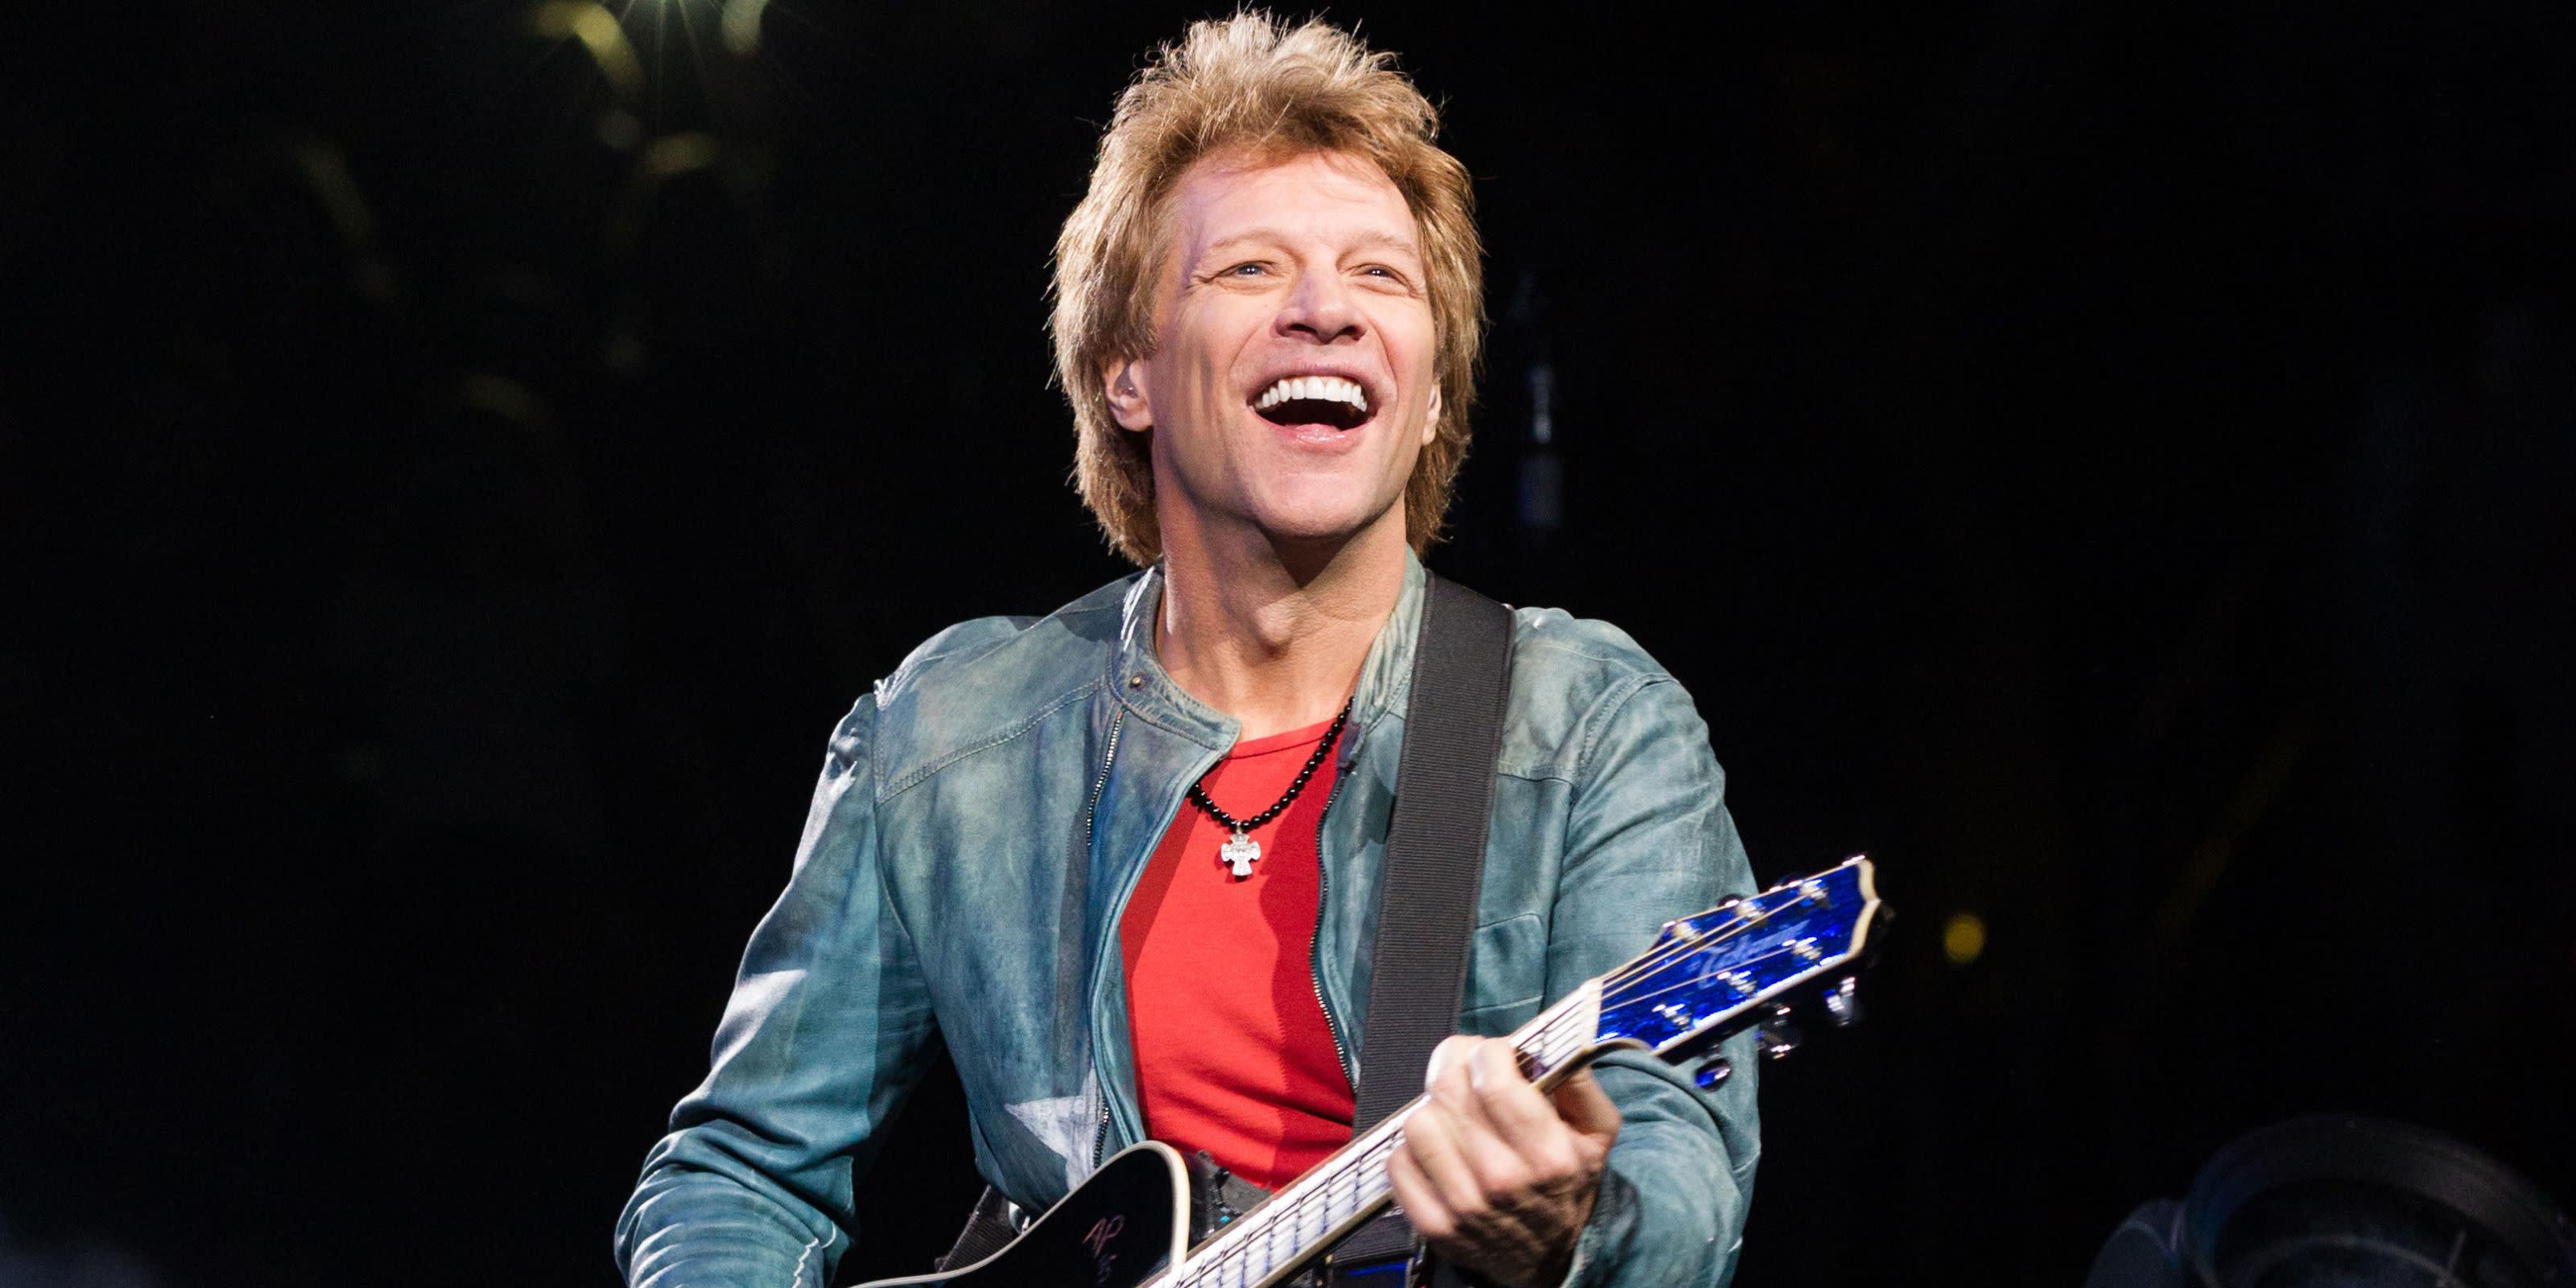 Discussion on this topic: Watch Jon Bon Jovi Surprise Fan Who , watch-jon-bon-jovi-surprise-fan-who/